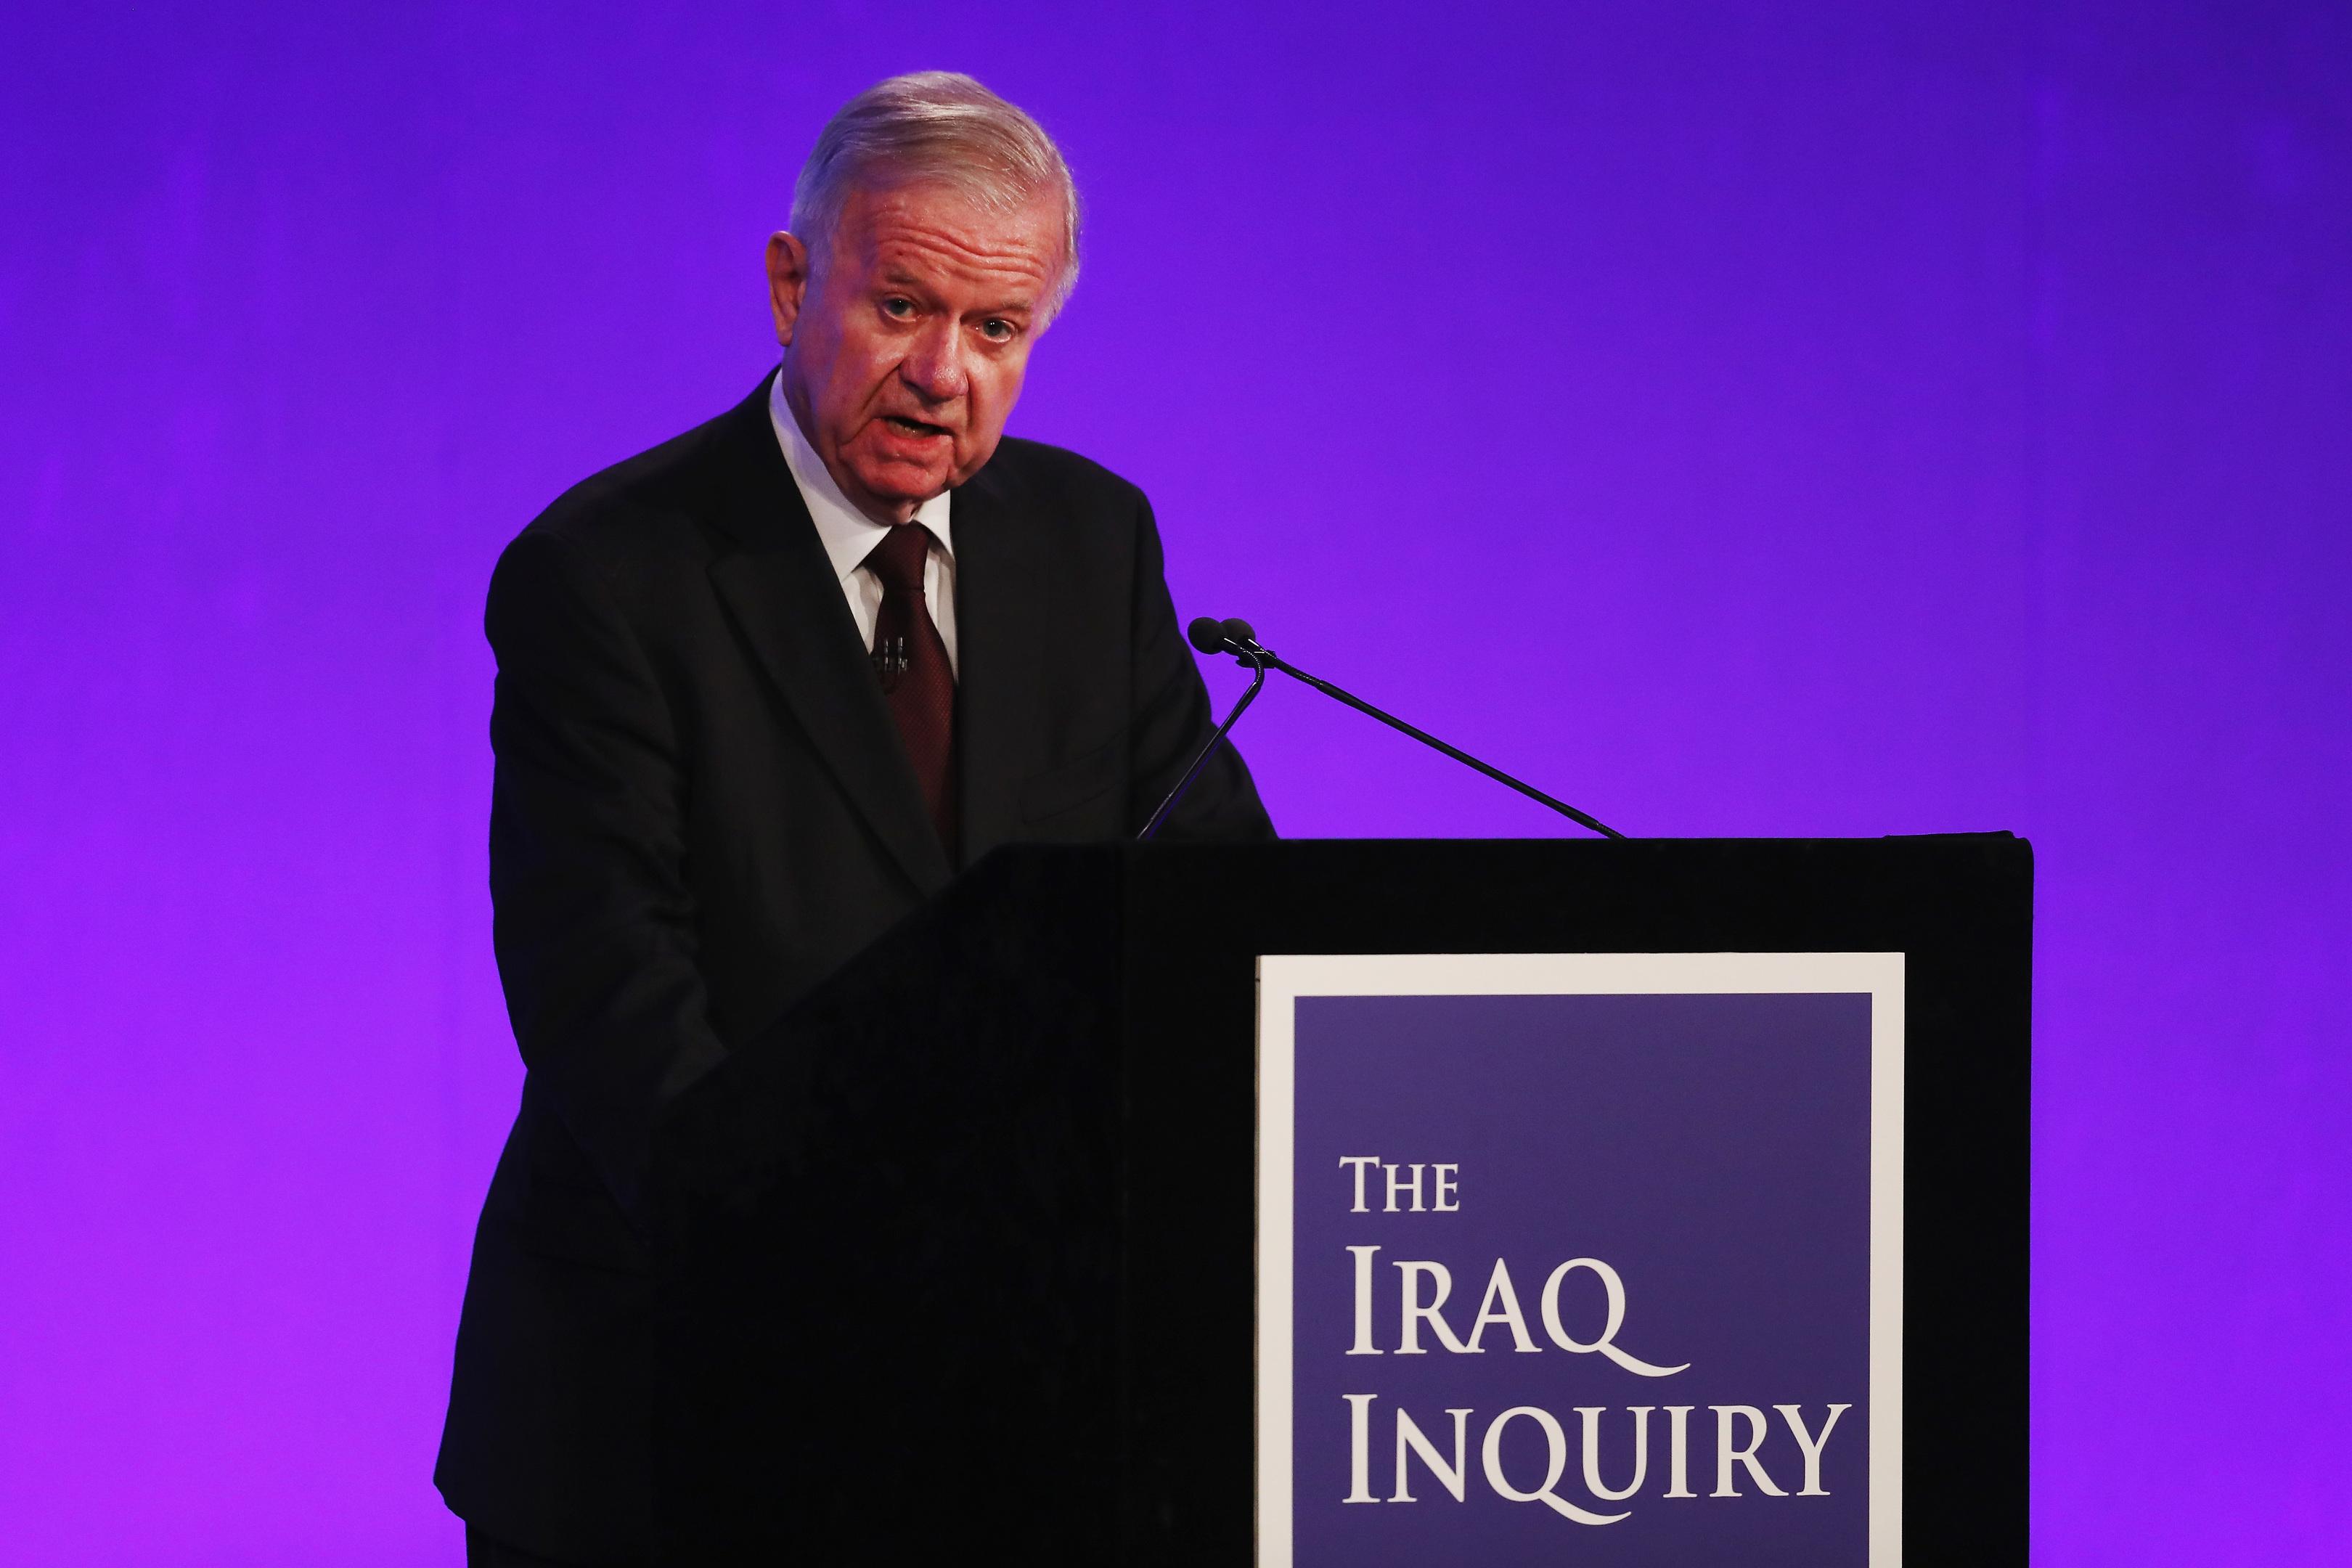 Sir John Chilcot presents the Iraq Inquiry Report (Dan Kitwood/Getty Images)